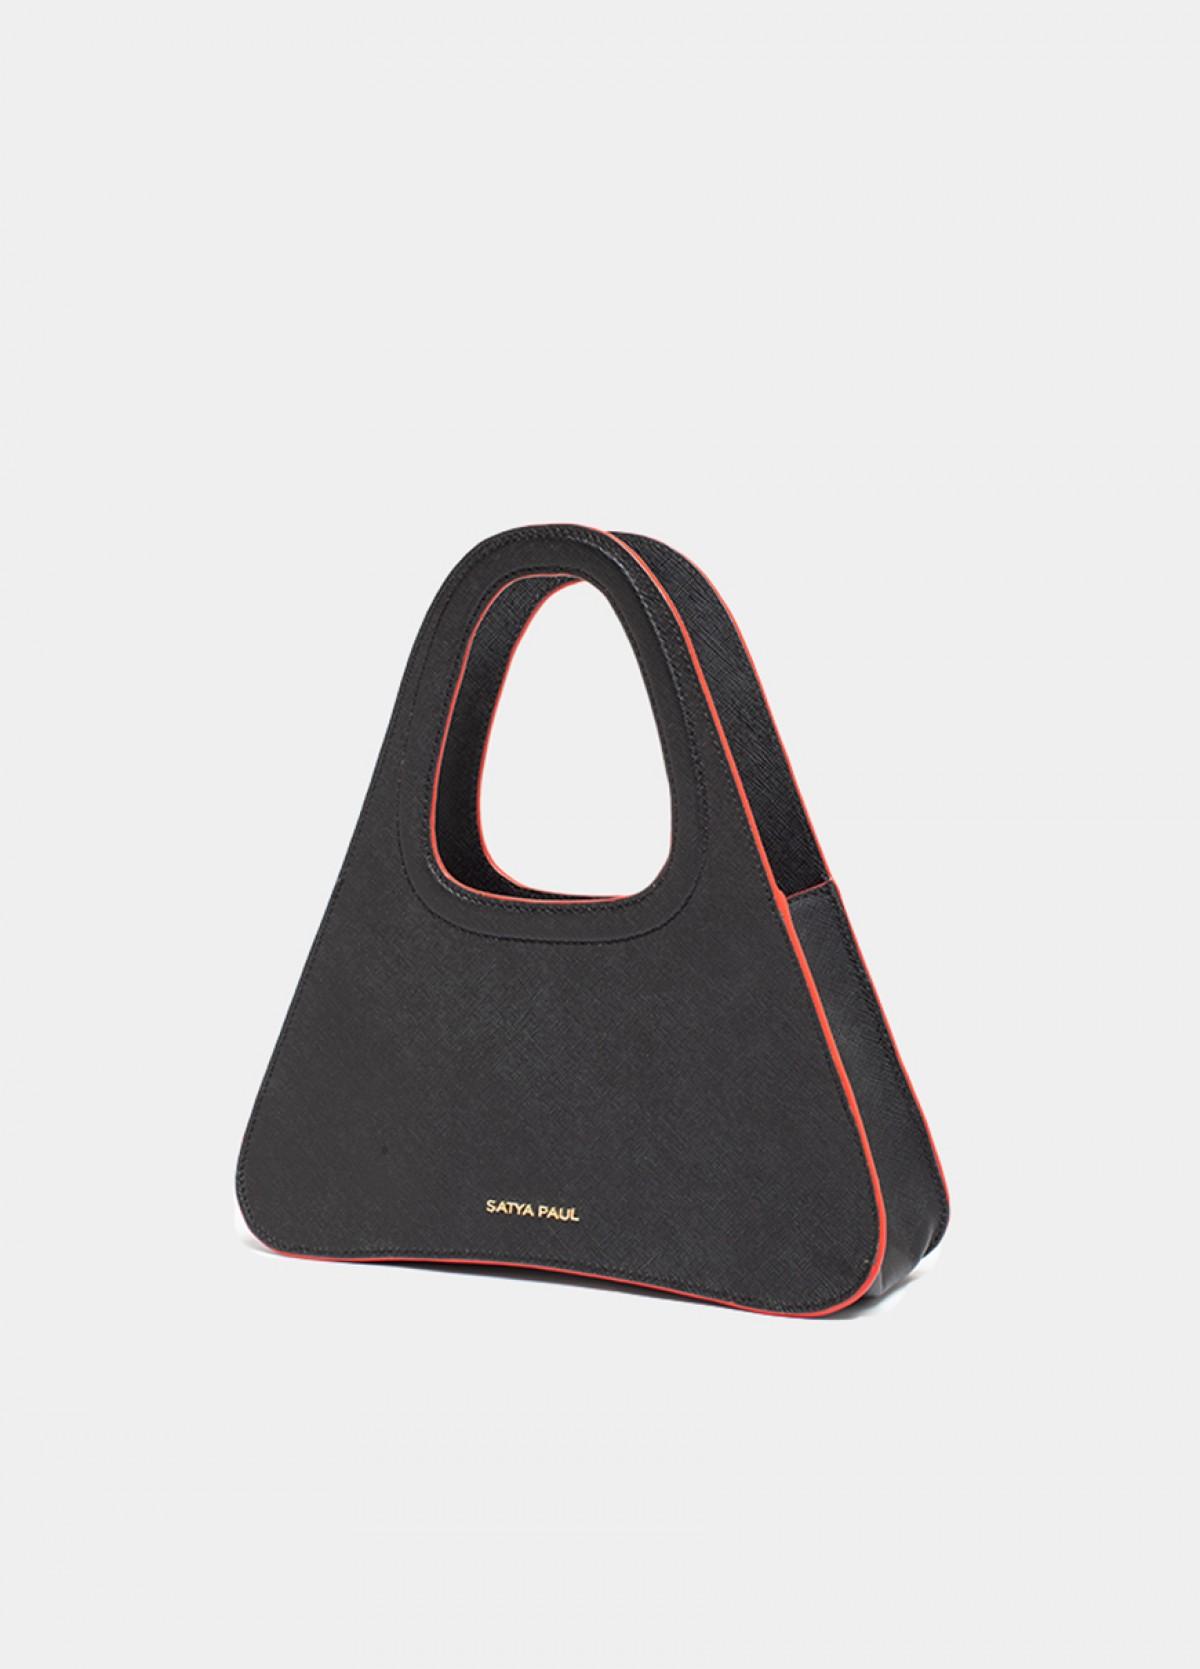 The Meru Handbag